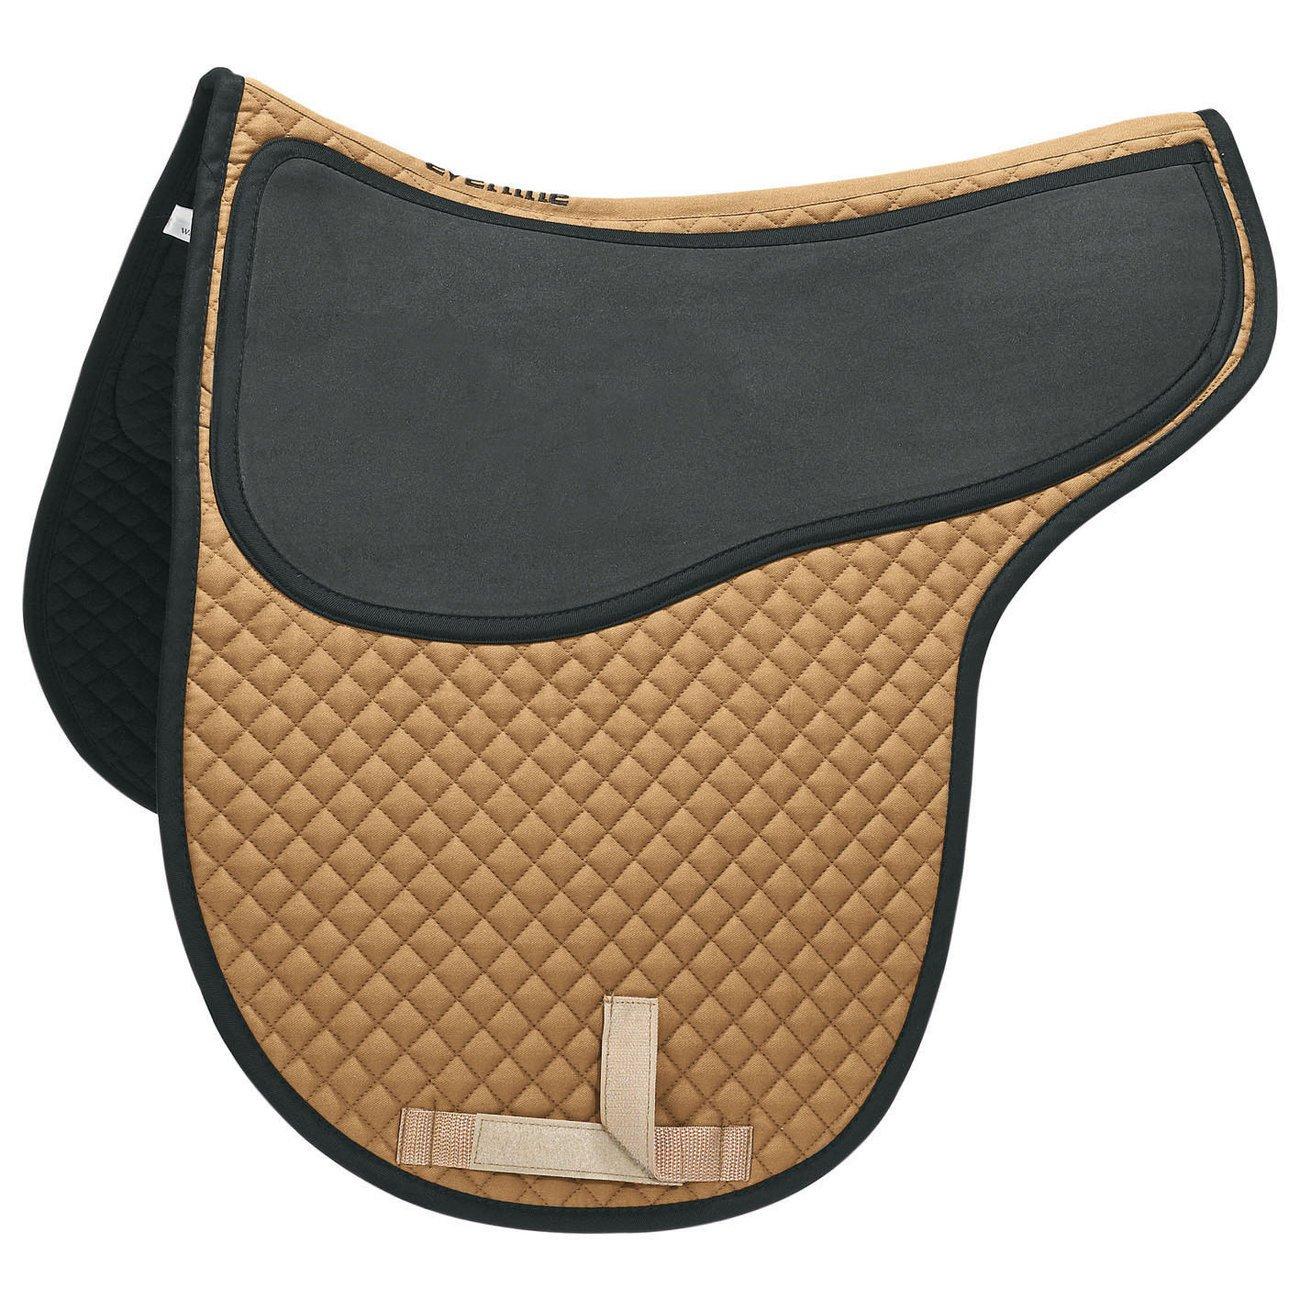 BUSSE Satteldecke Perfect Fit, Dressur, Voll-, Warmblut - caramel, black